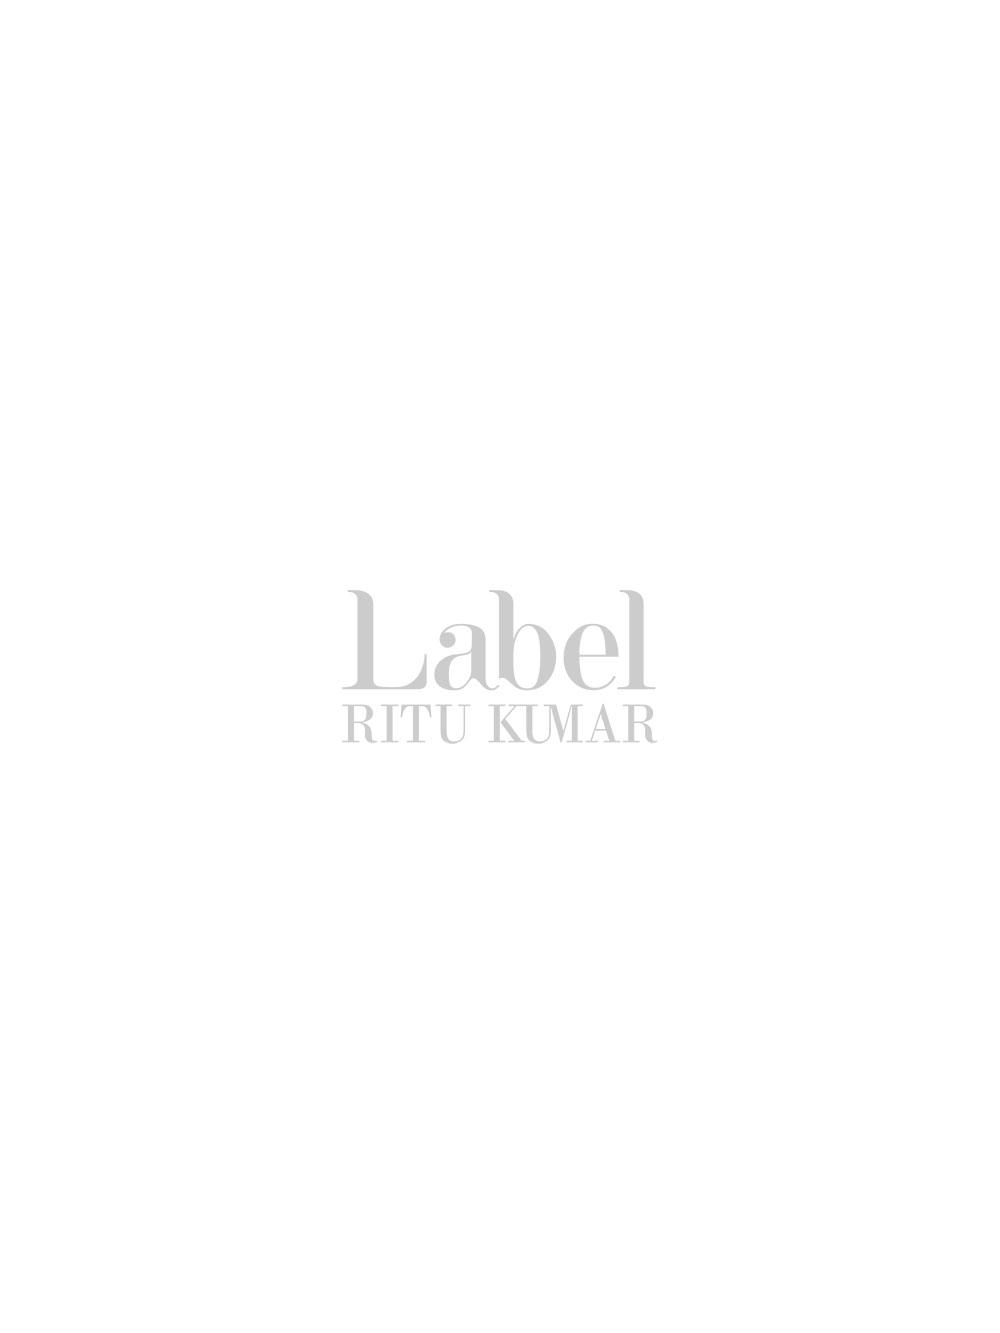 Beige & Black Floral Motif High-Low Dress